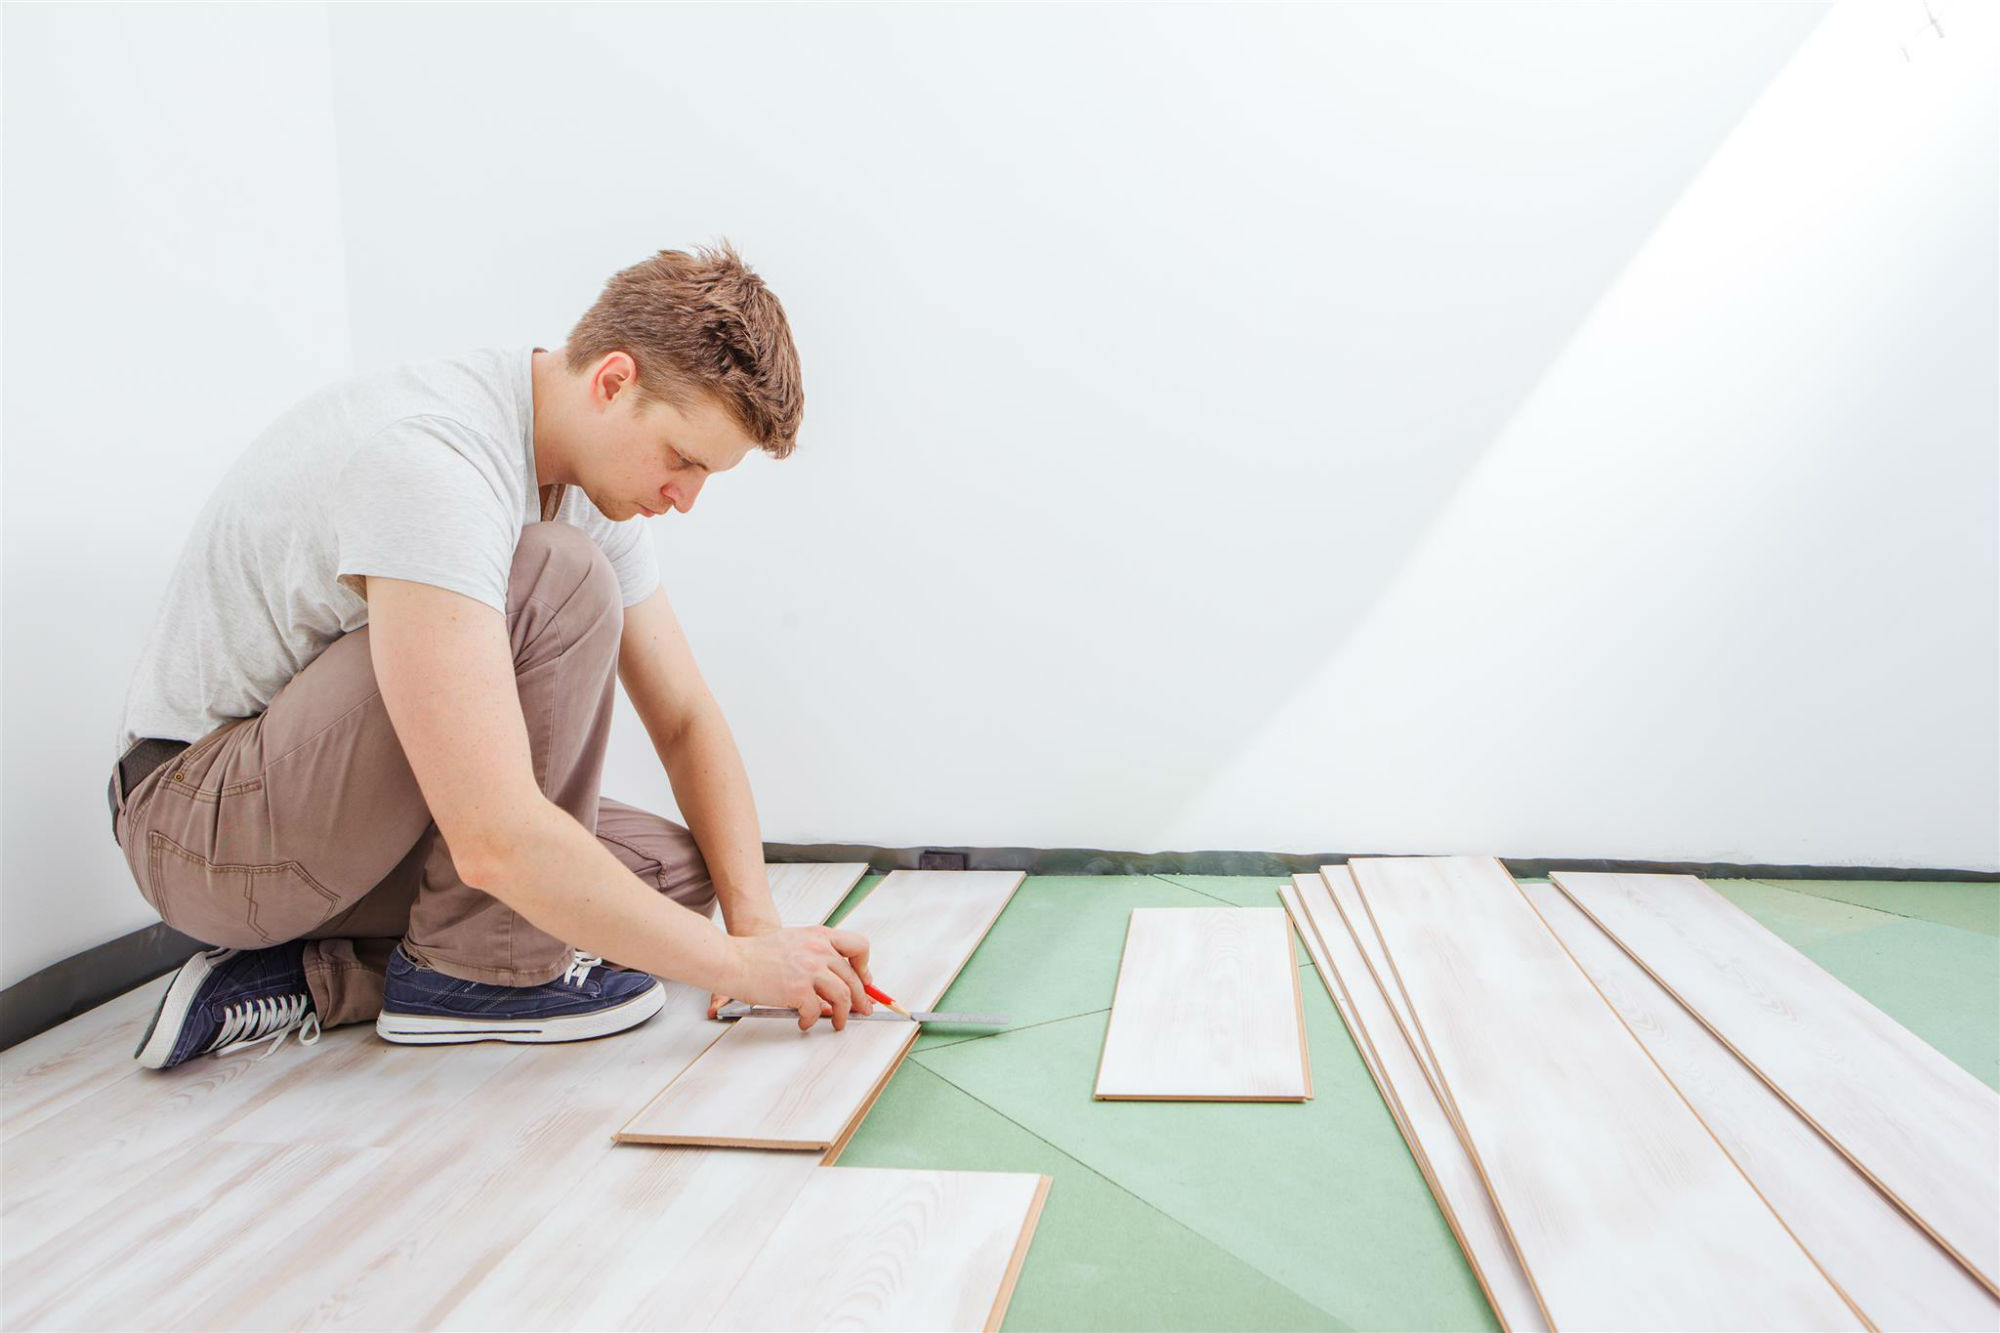 hardwood floor refinishing bridgeport ct of professional flooring services in the area of bridgeport ct 06606 in commercial floor finish